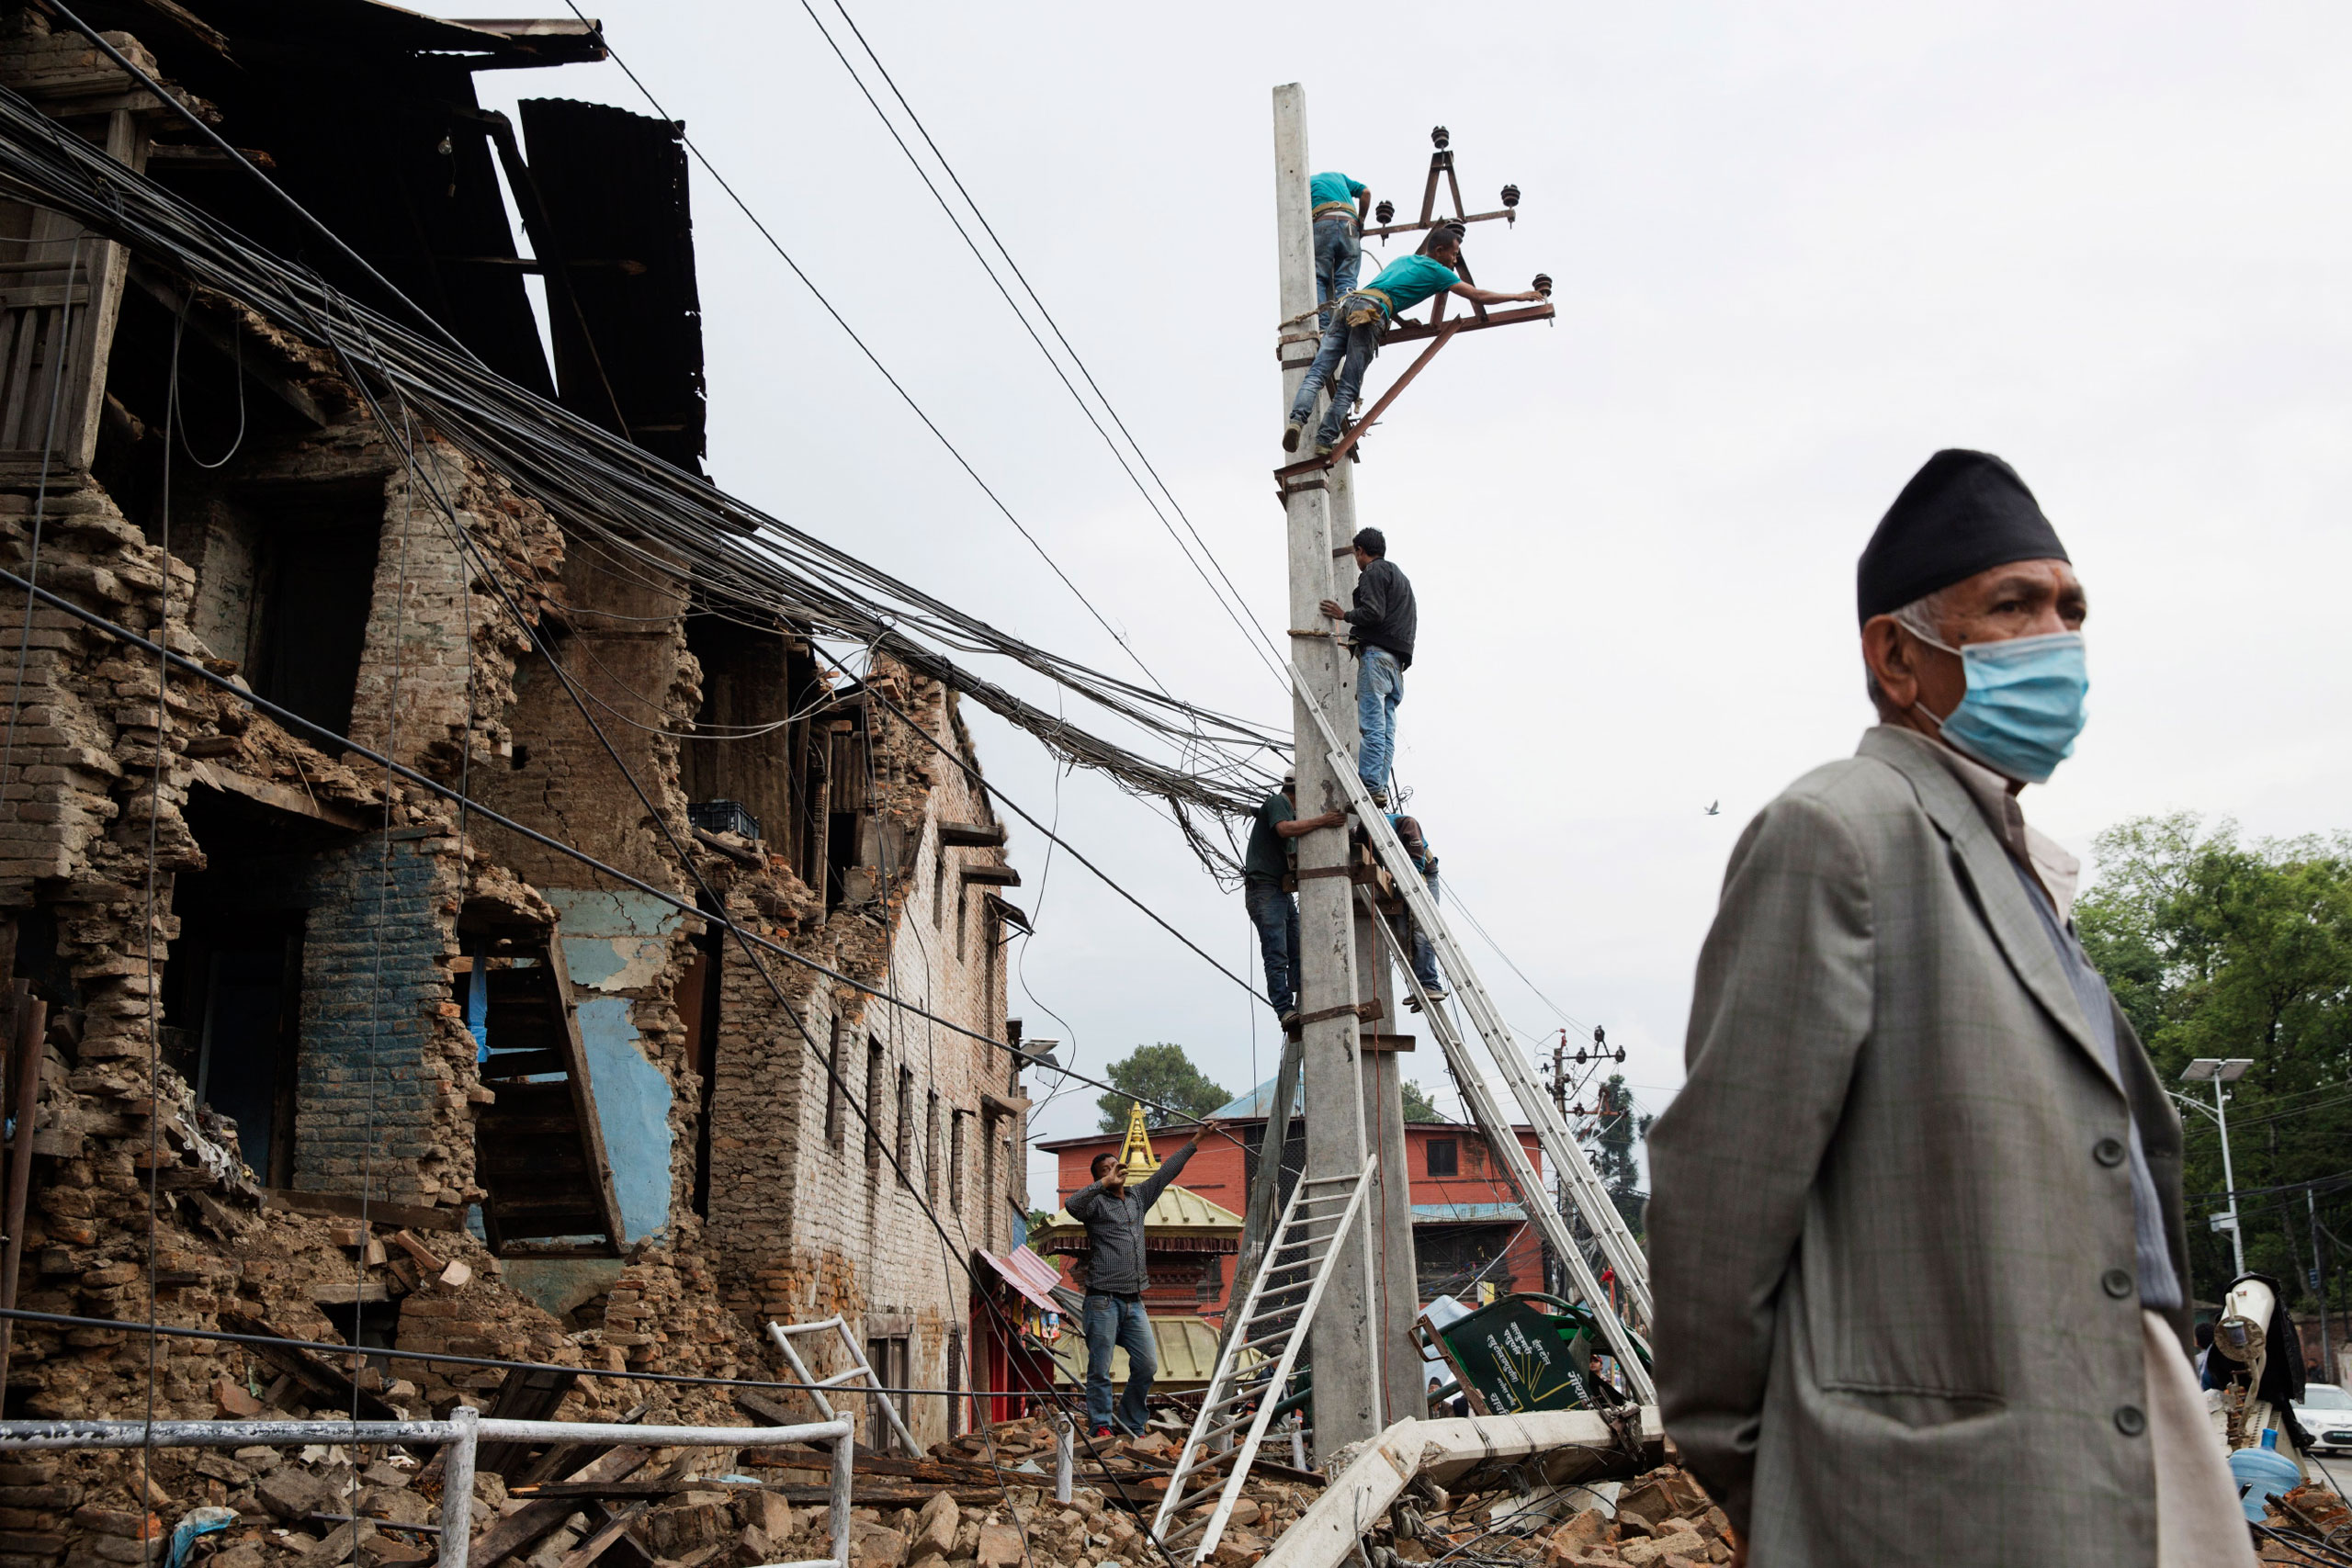 Workers repair power lines in Kathmandu, April 28, 2015.